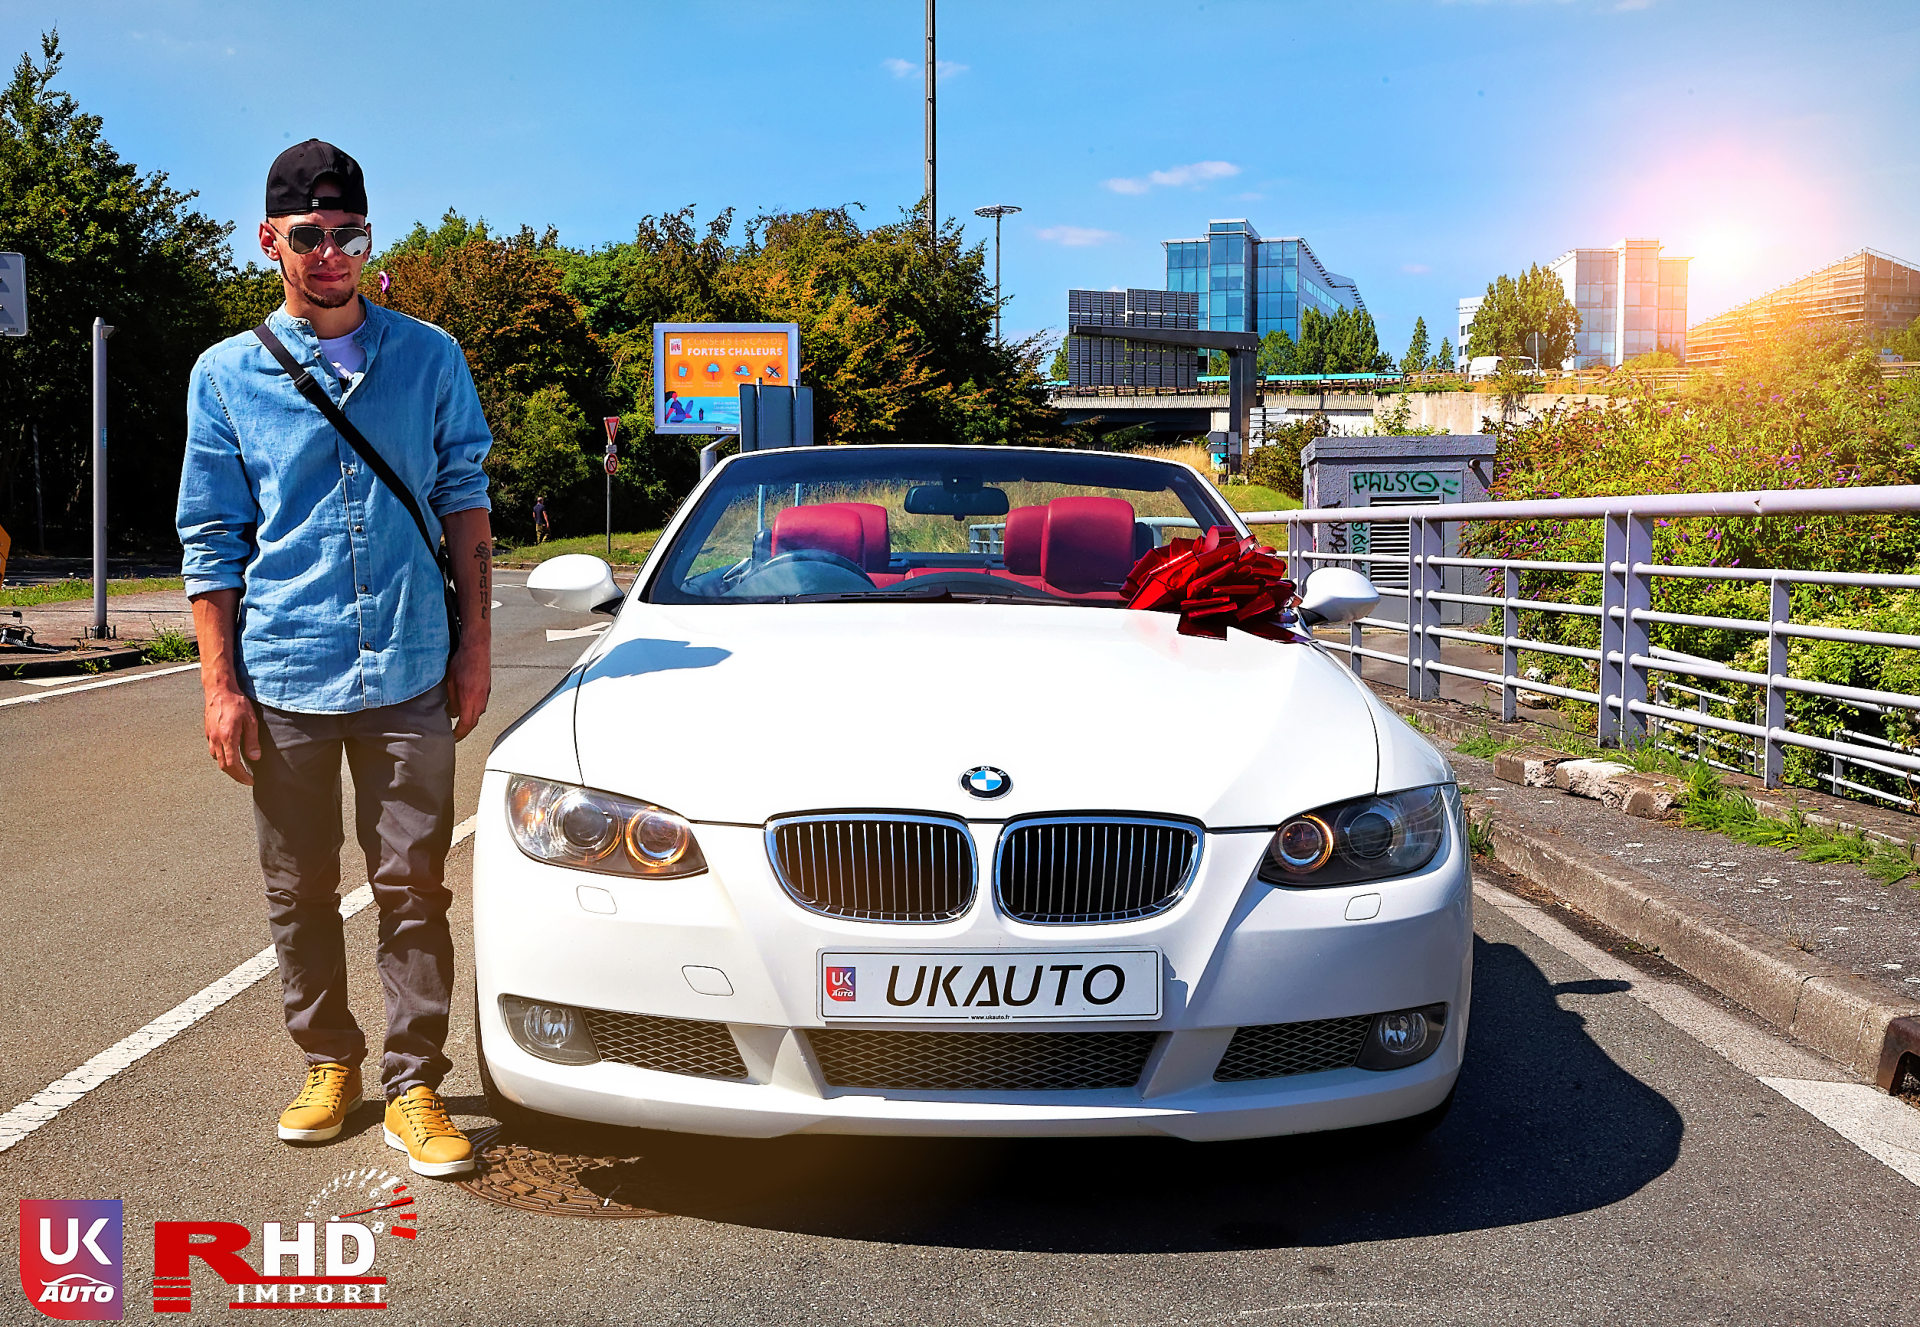 Bmw importation uk bmw 335i e92 rhd ukauto import voiture angleterre2 DxO - IMPORT AUTO BMW 335 I PACK M MANDATAIRE UK FELICITATION A ANTOINE CLIENT SATISFAIT